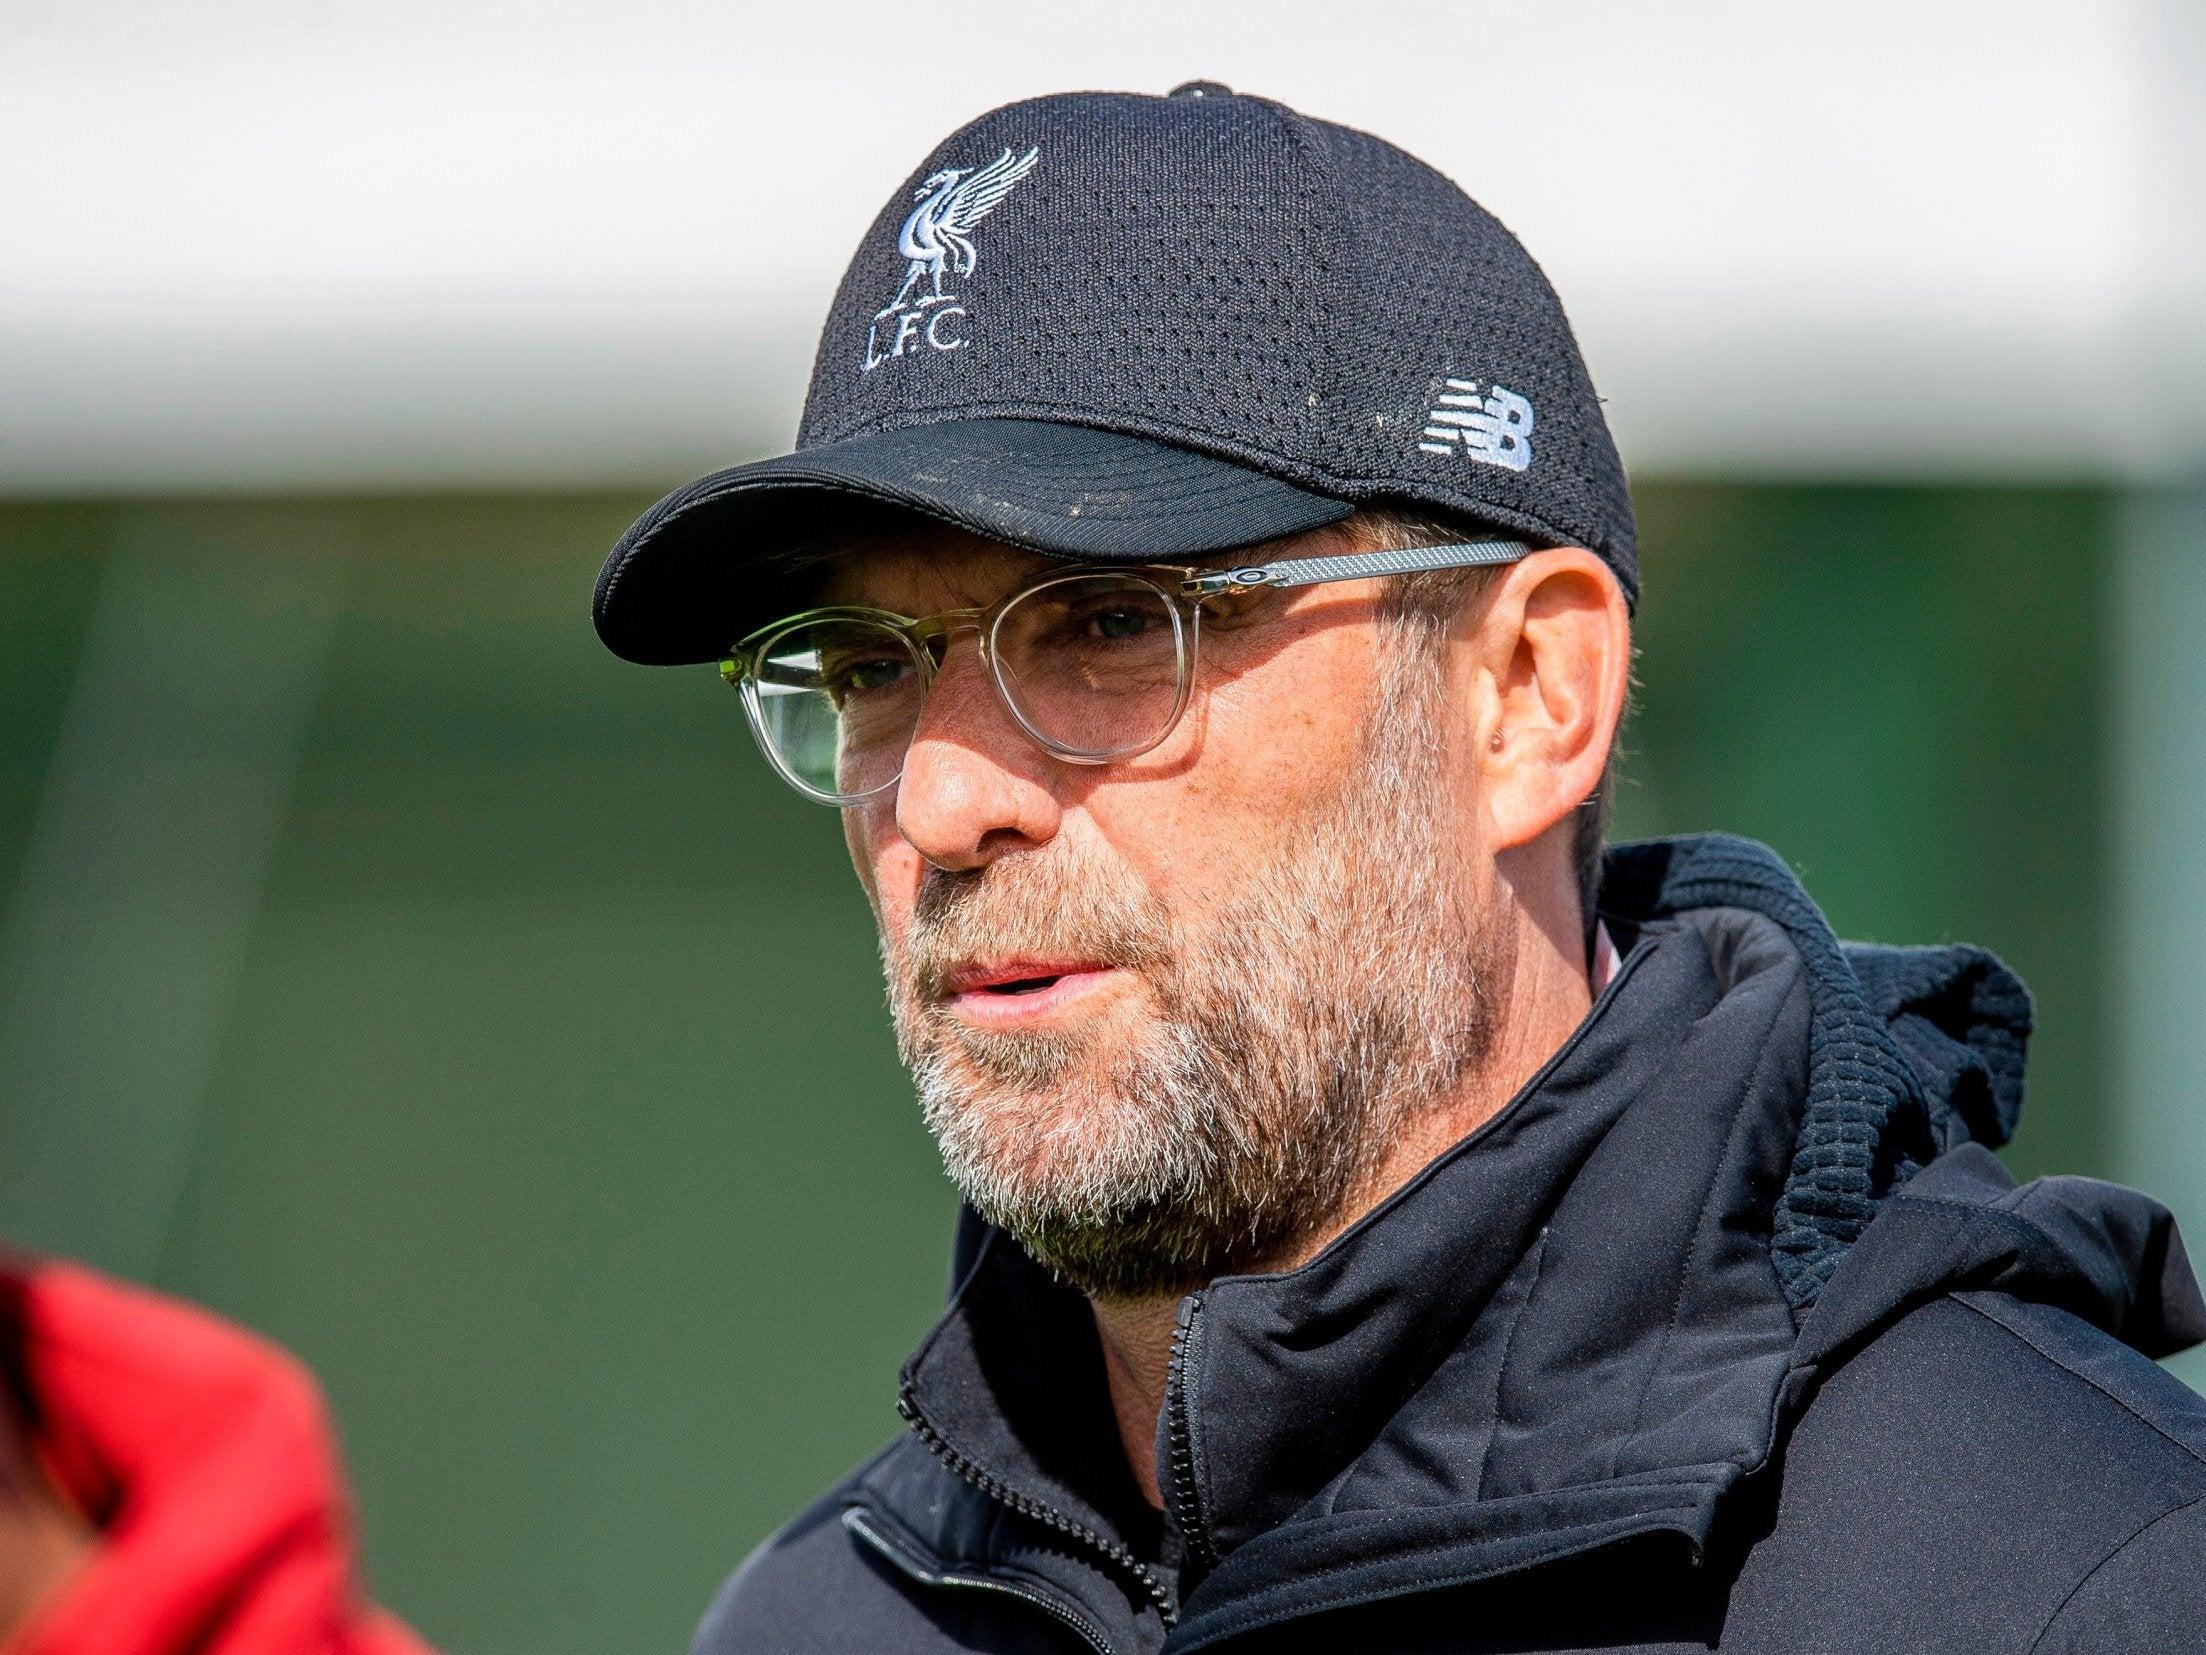 Liverpool news: Jurgen Klopp questions Champions League and Nations League schedule